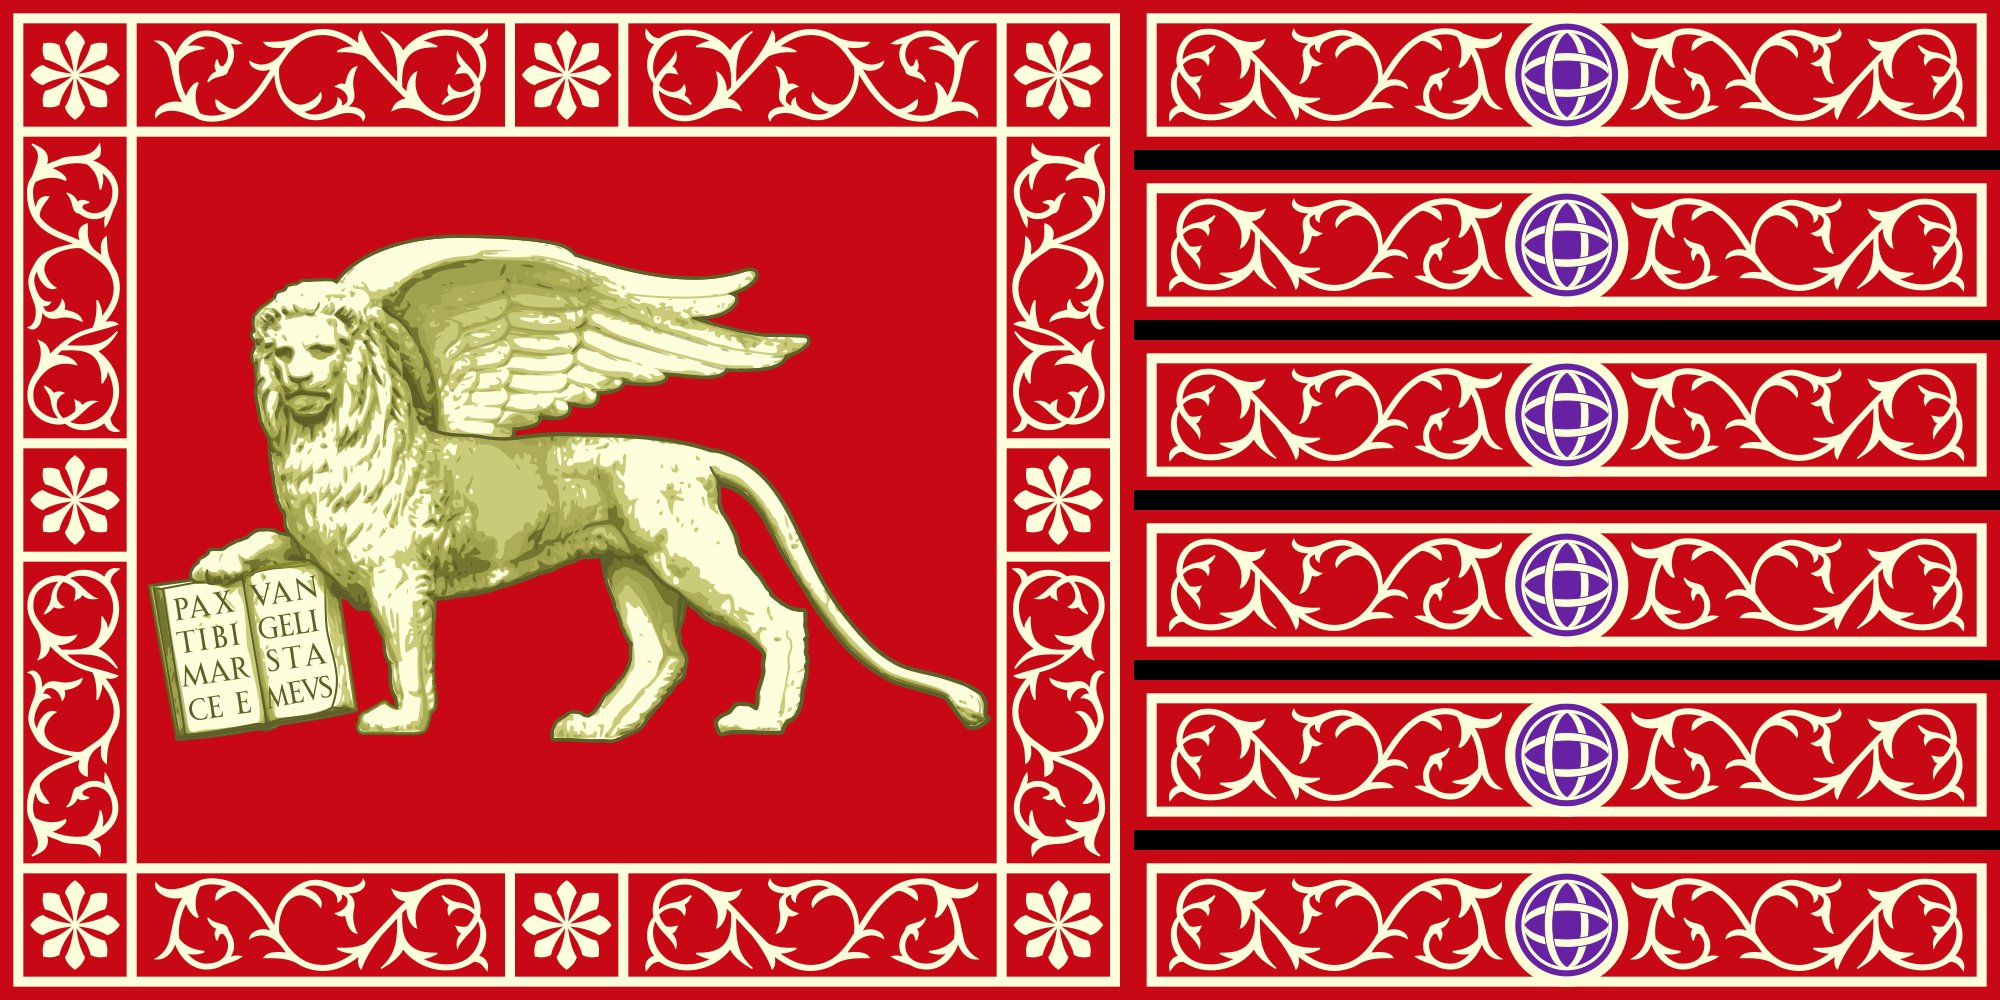 2000px-flag_of_most_serene_republic_of_venice-svg-1.jpg